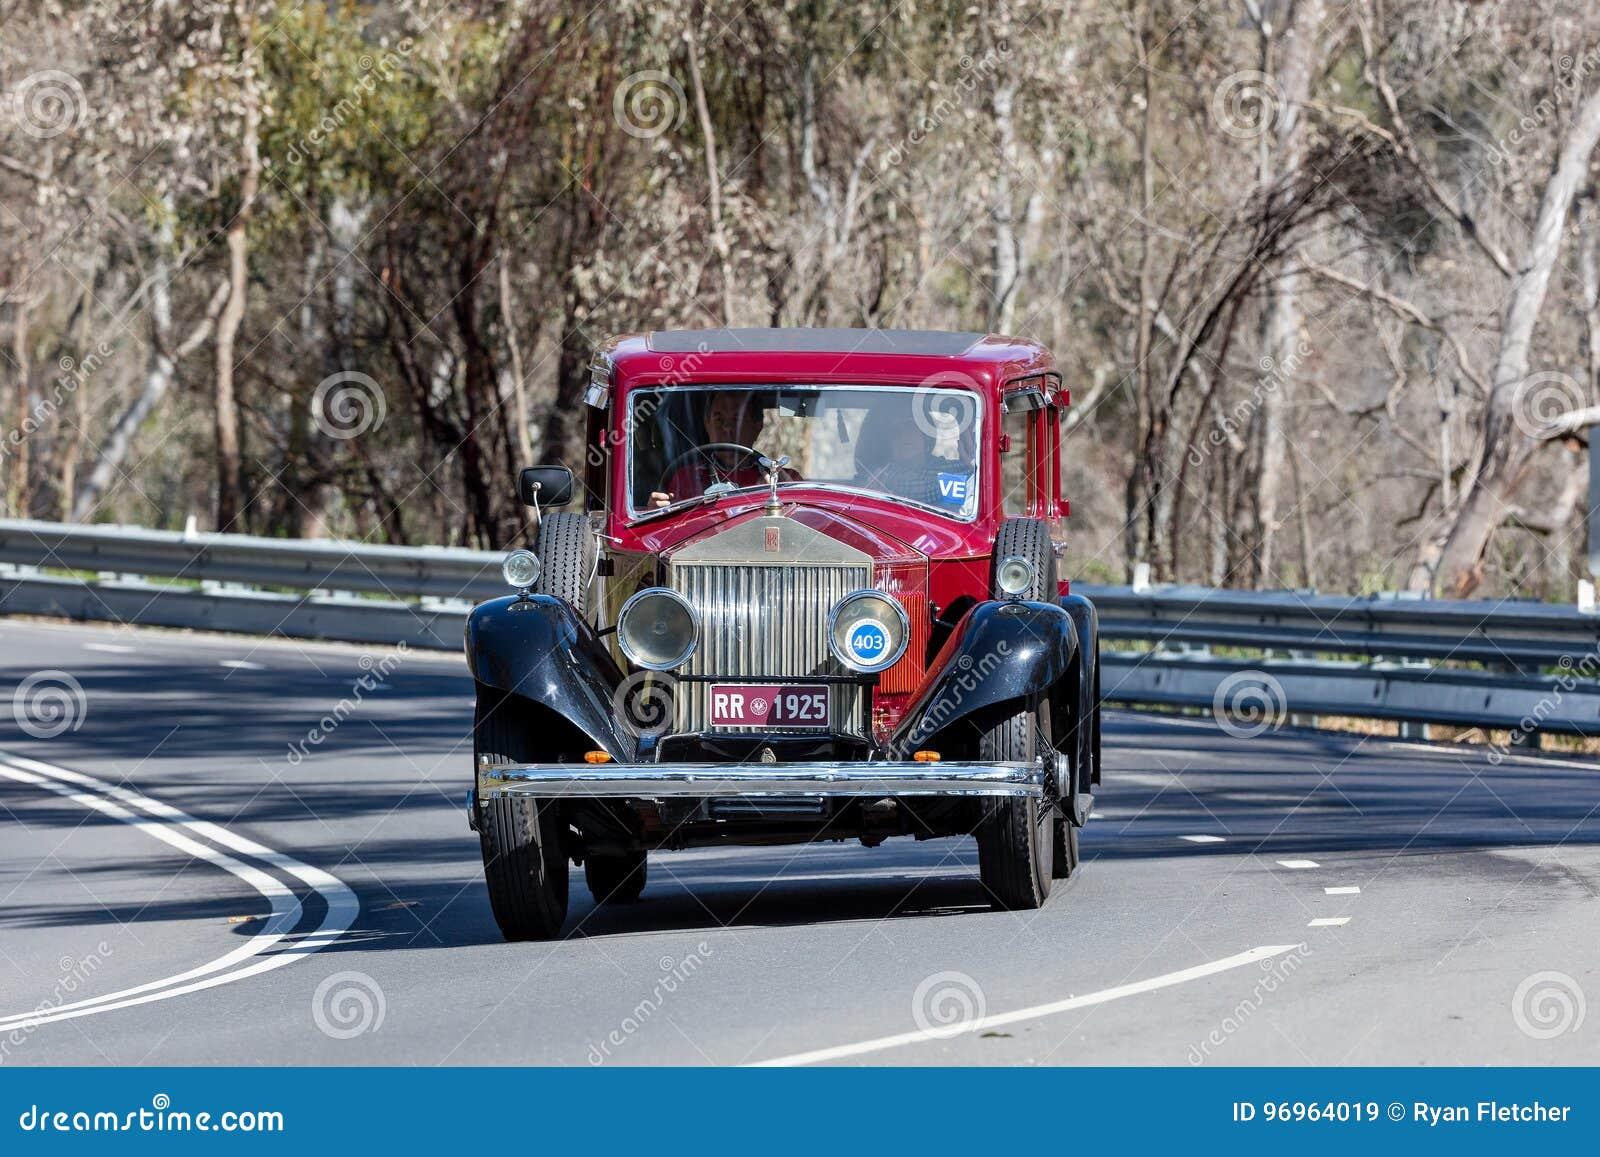 1925 Rolls Royce Phantom >> 1925 Rolls Royce Phantom 1 Limosine Editorial Stock Image